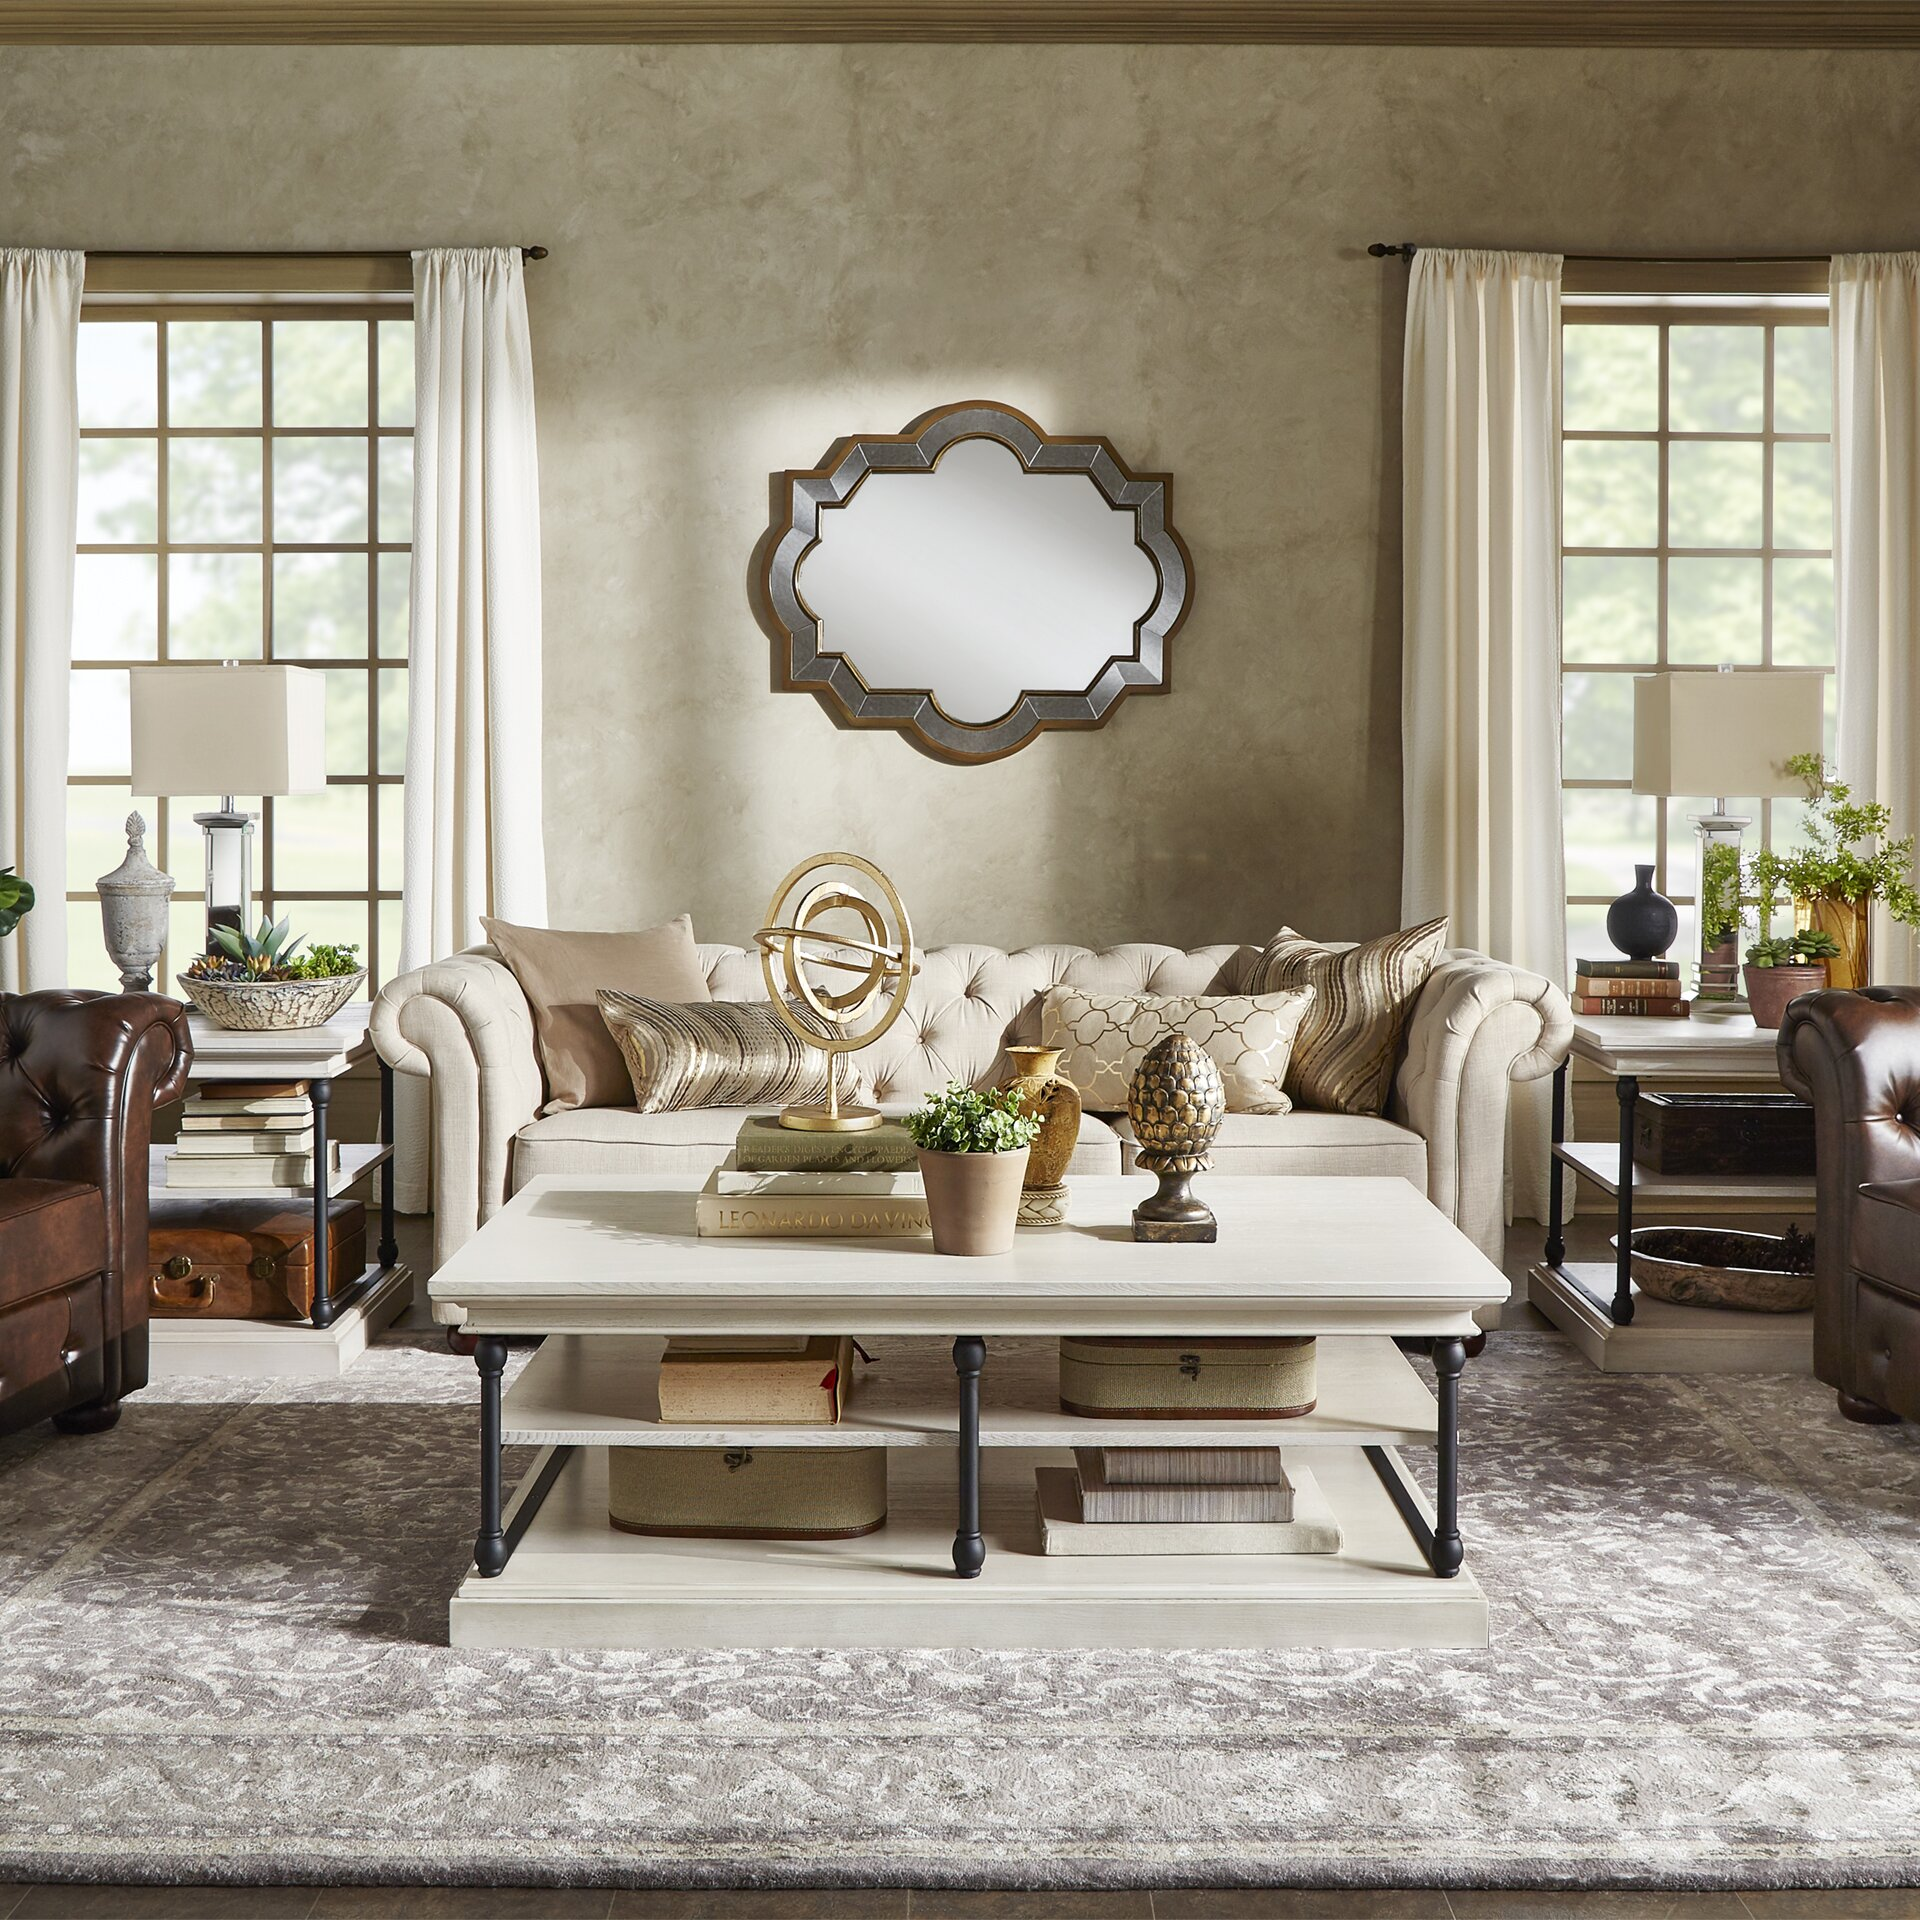 Living Room With Chesterfield Sofa Tilda 91 Chesterfield Sofa Reviews Joss Main